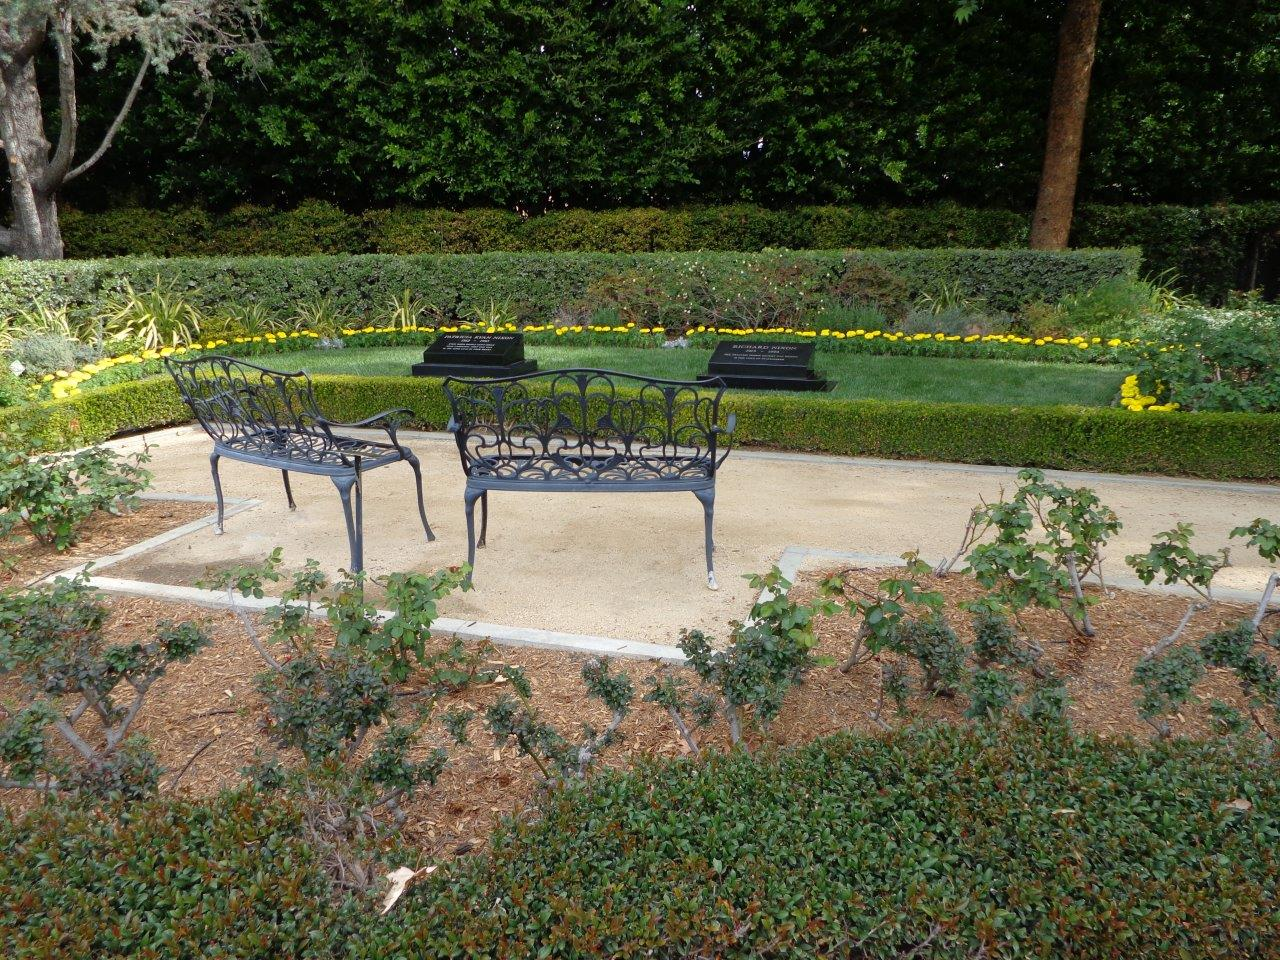 Richard Nixon gravesite